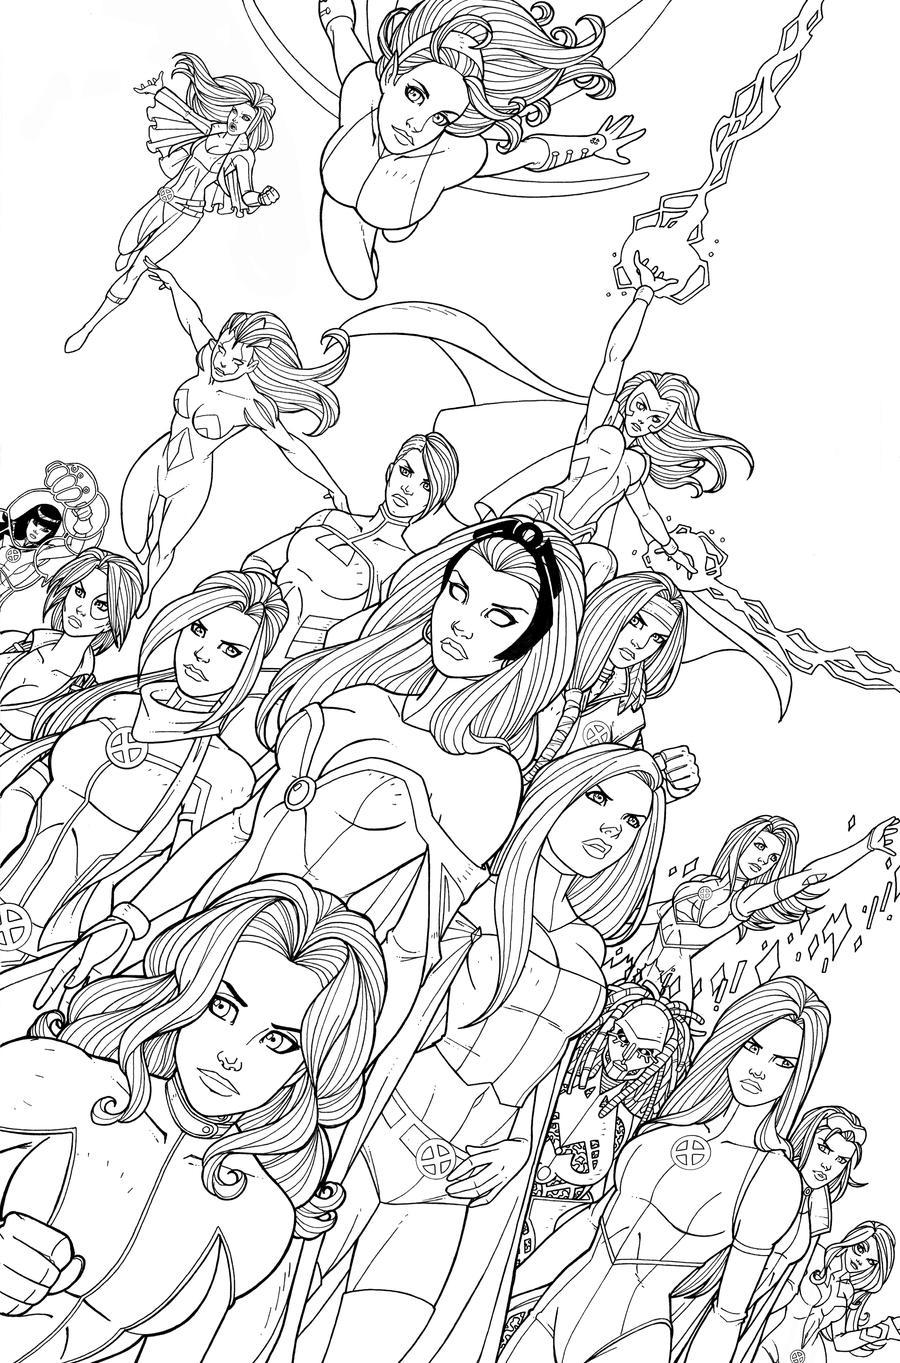 Line Art Comic : X women line art by jamiefayx on deviantart